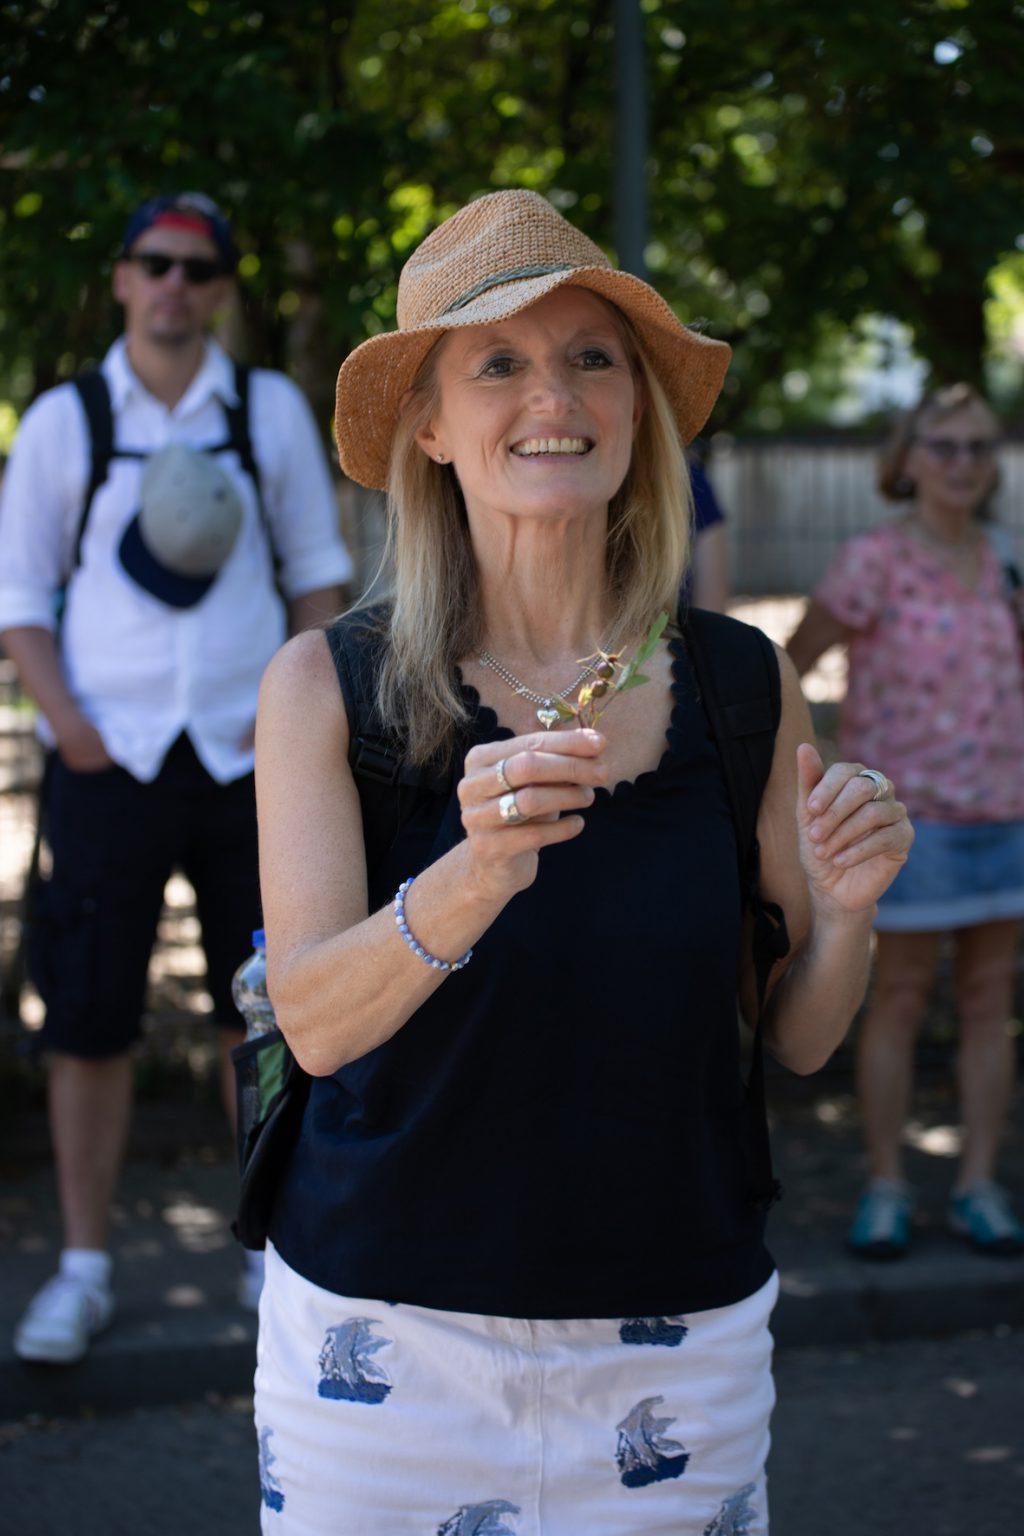 Caroline Deiss